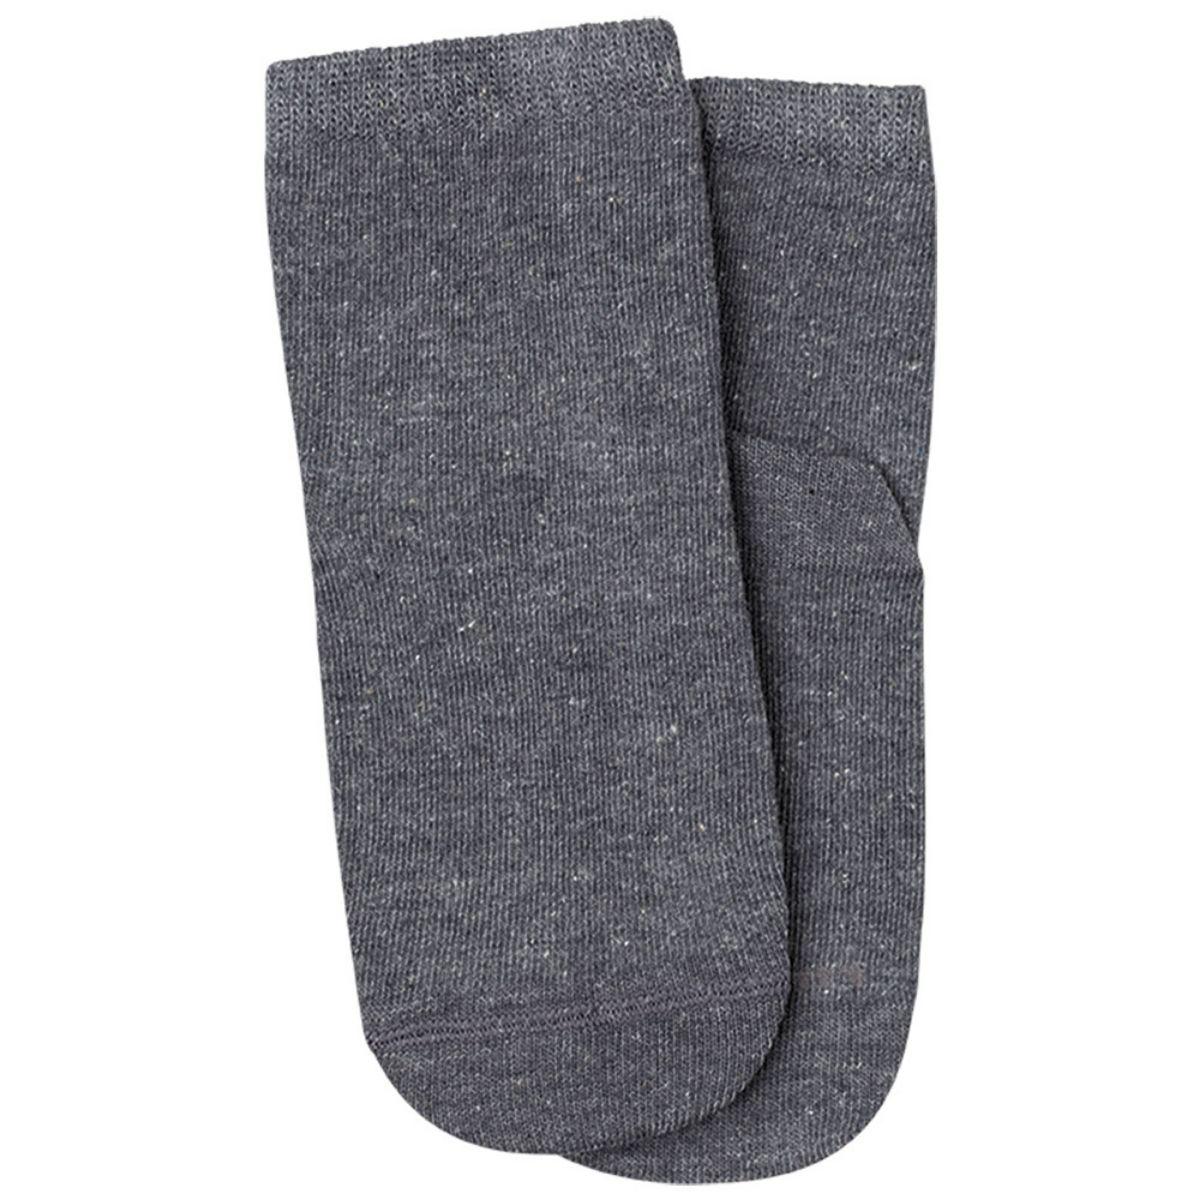 Kit 3 meias menino divertidas lisas estampadas lupo